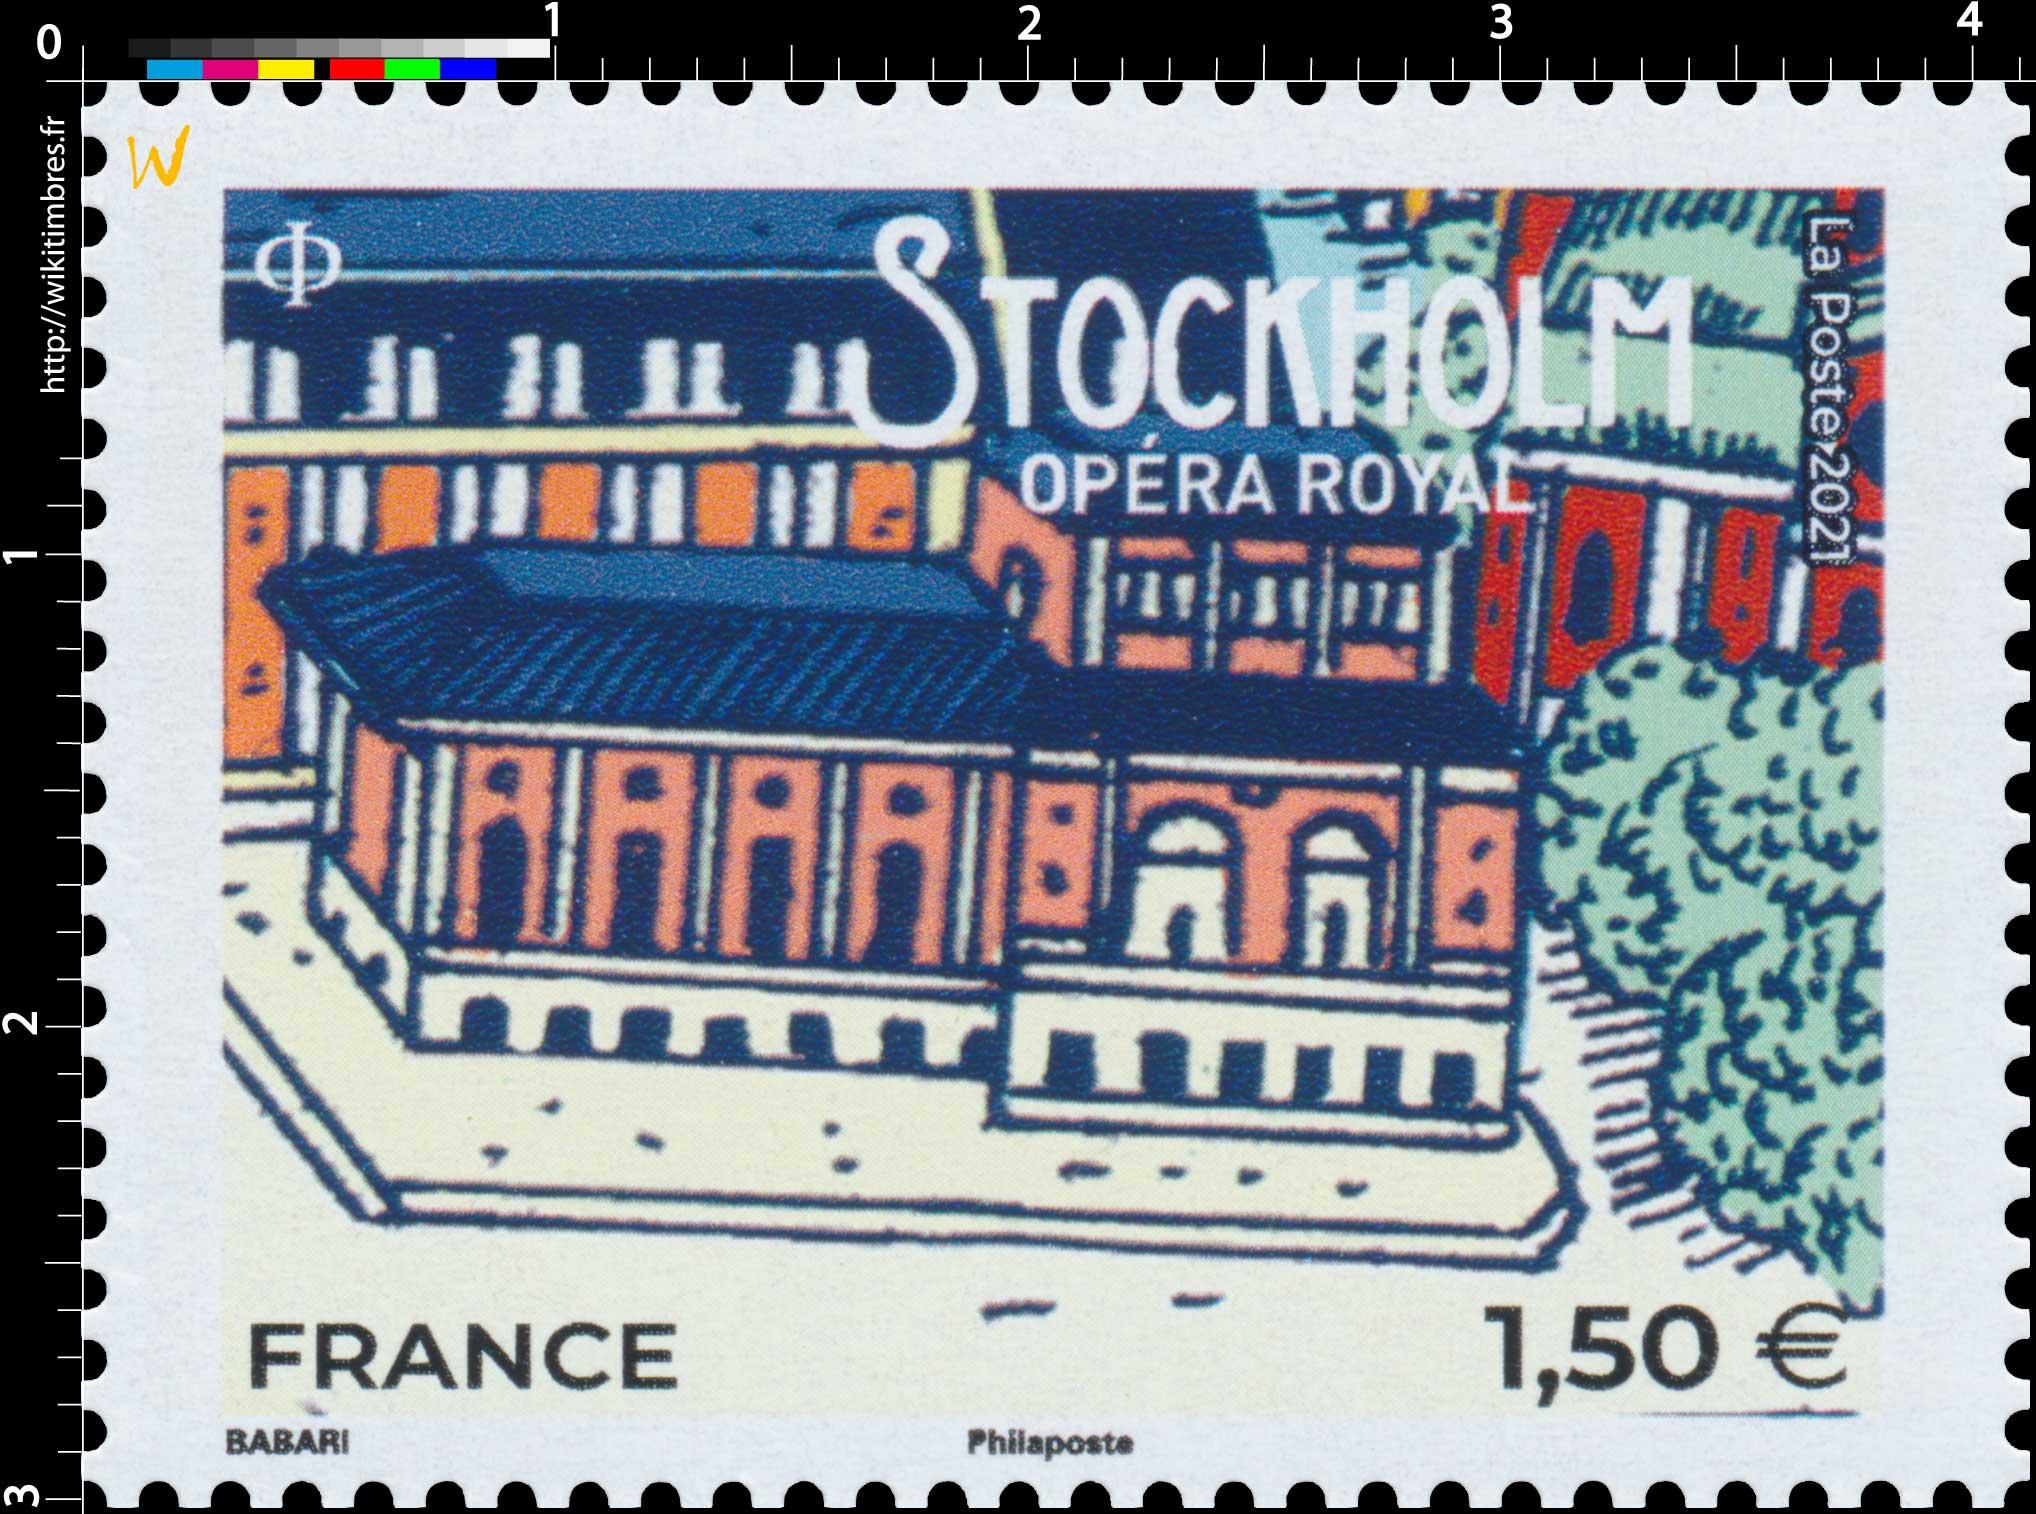 2021 STOCKHOLM - Opéra royal